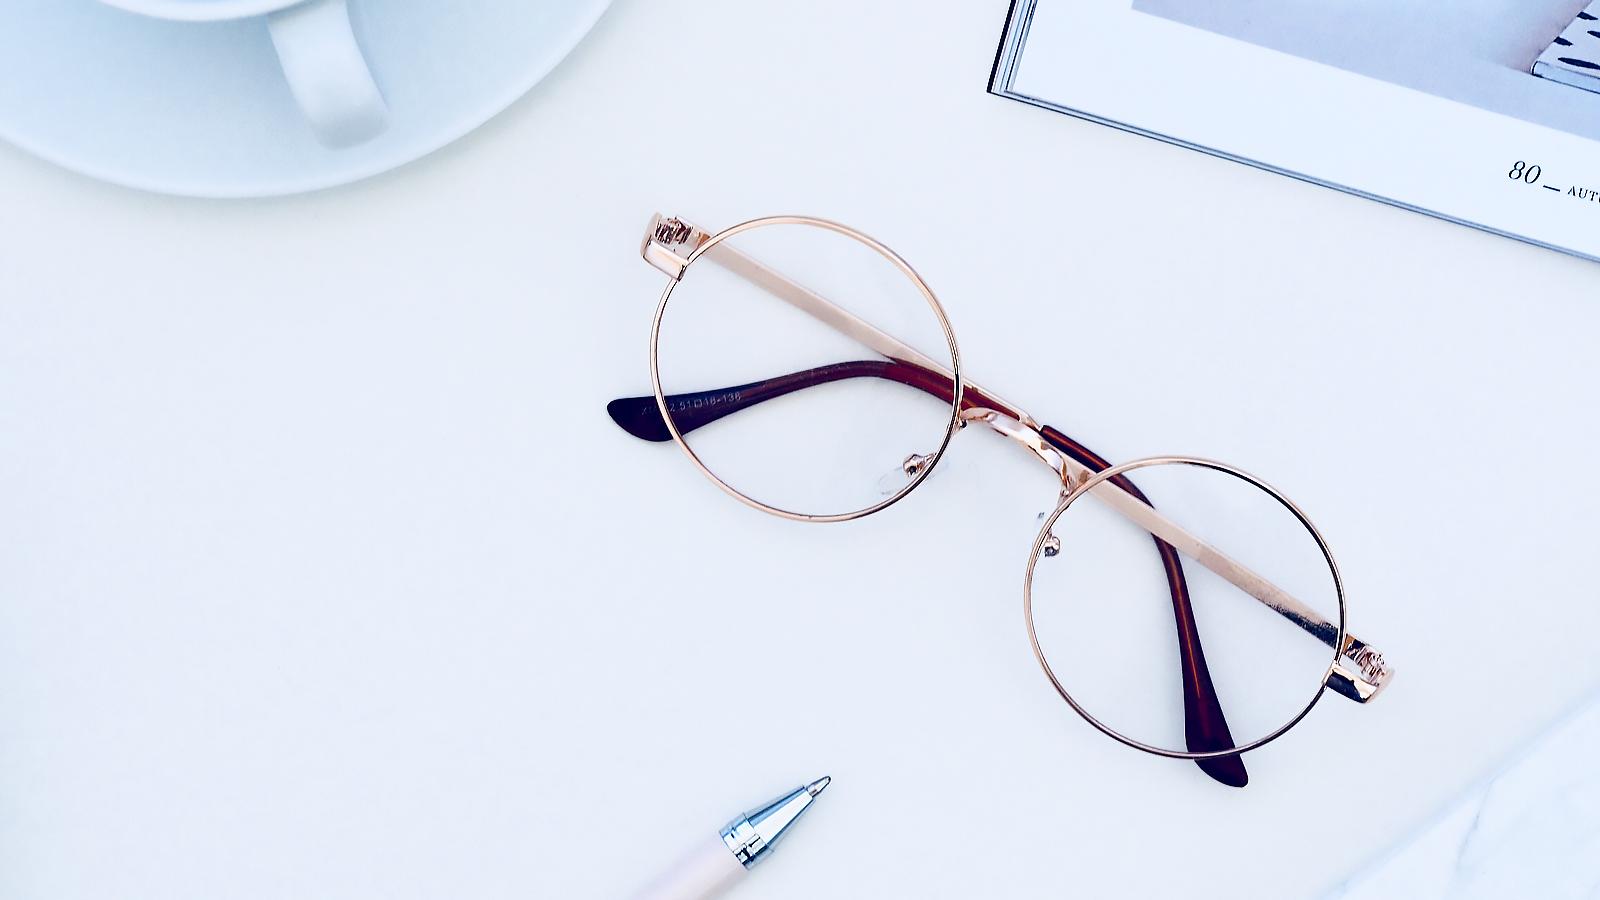 Why Choose Titanium Frame Glasses?